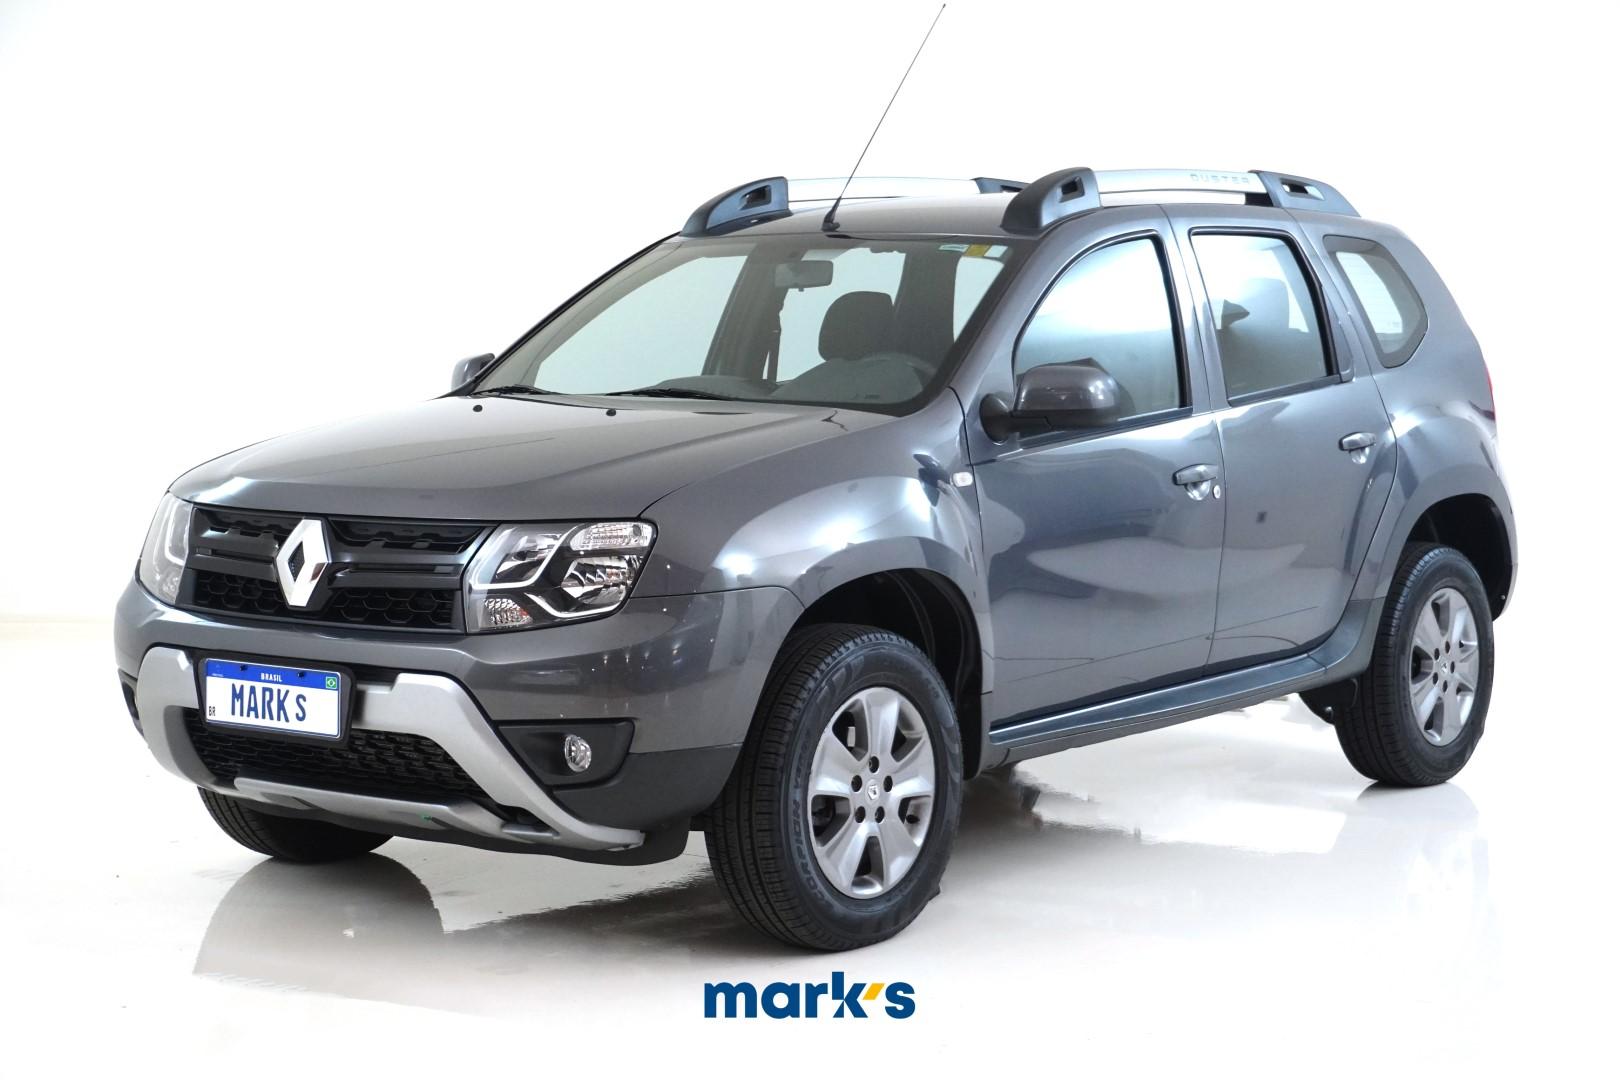 Foto do veículo Renault Duster